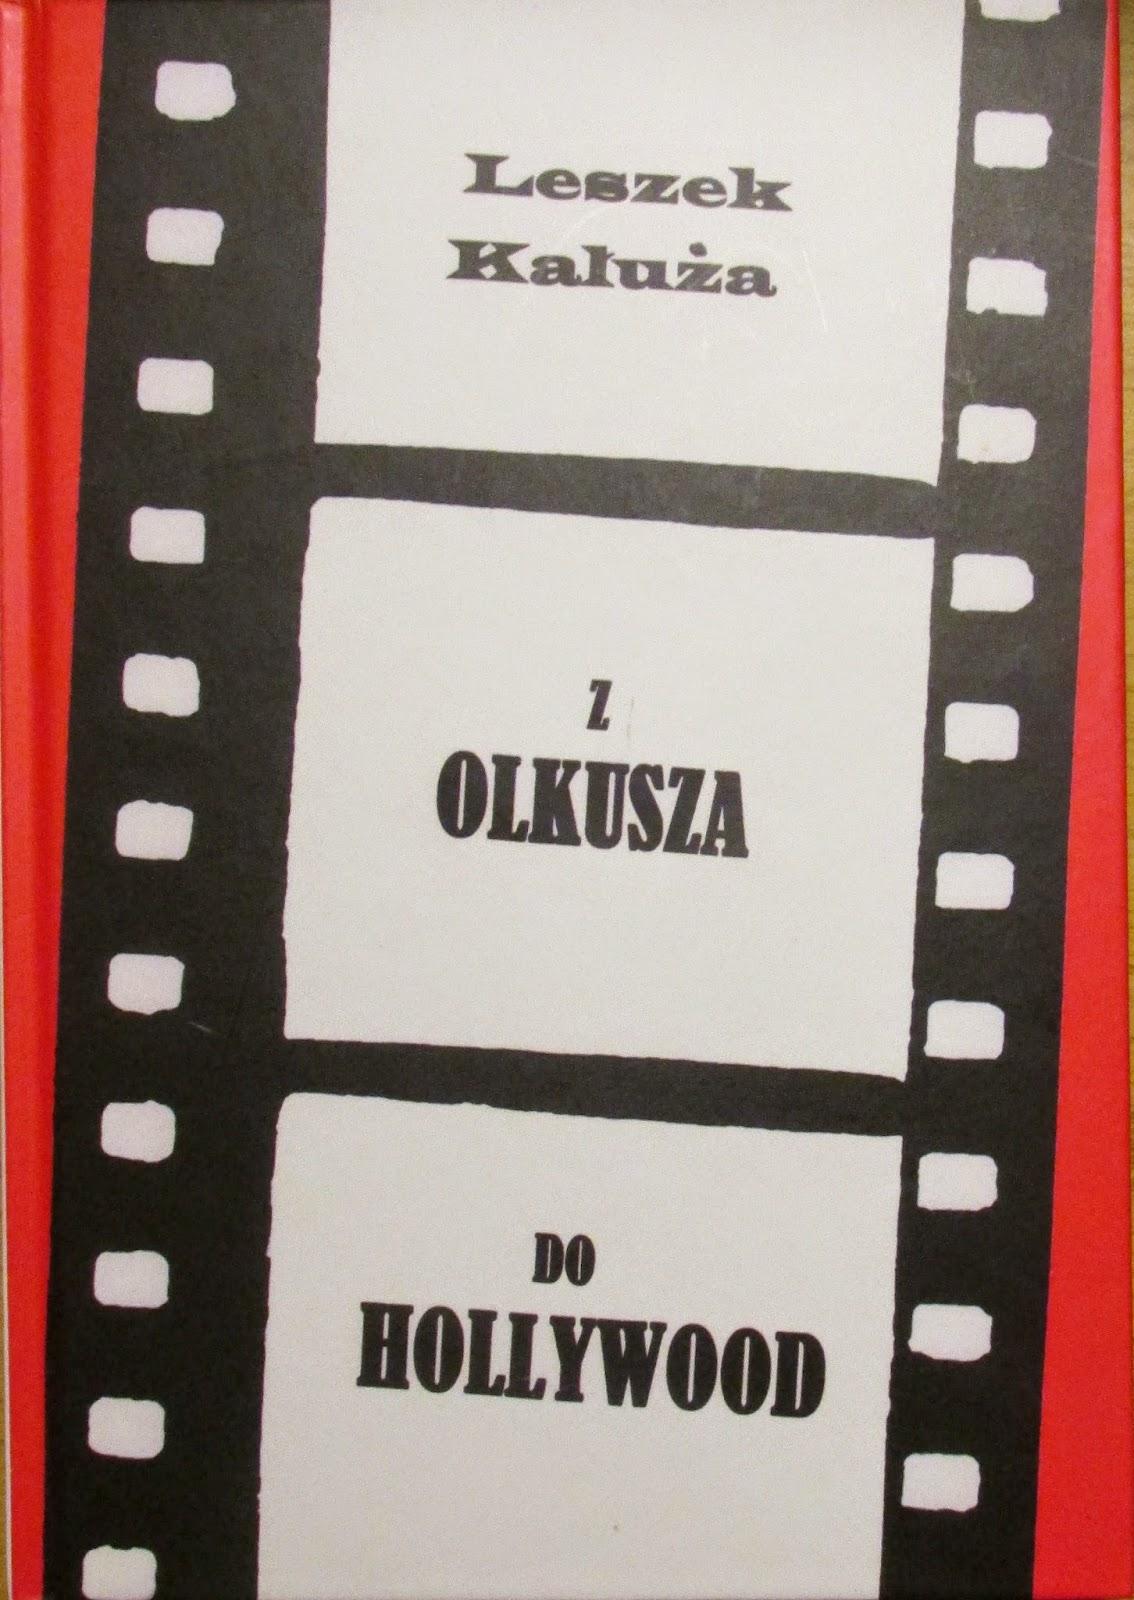 """Z Olkusza do Hollywood"" - Leszek Kałuża"